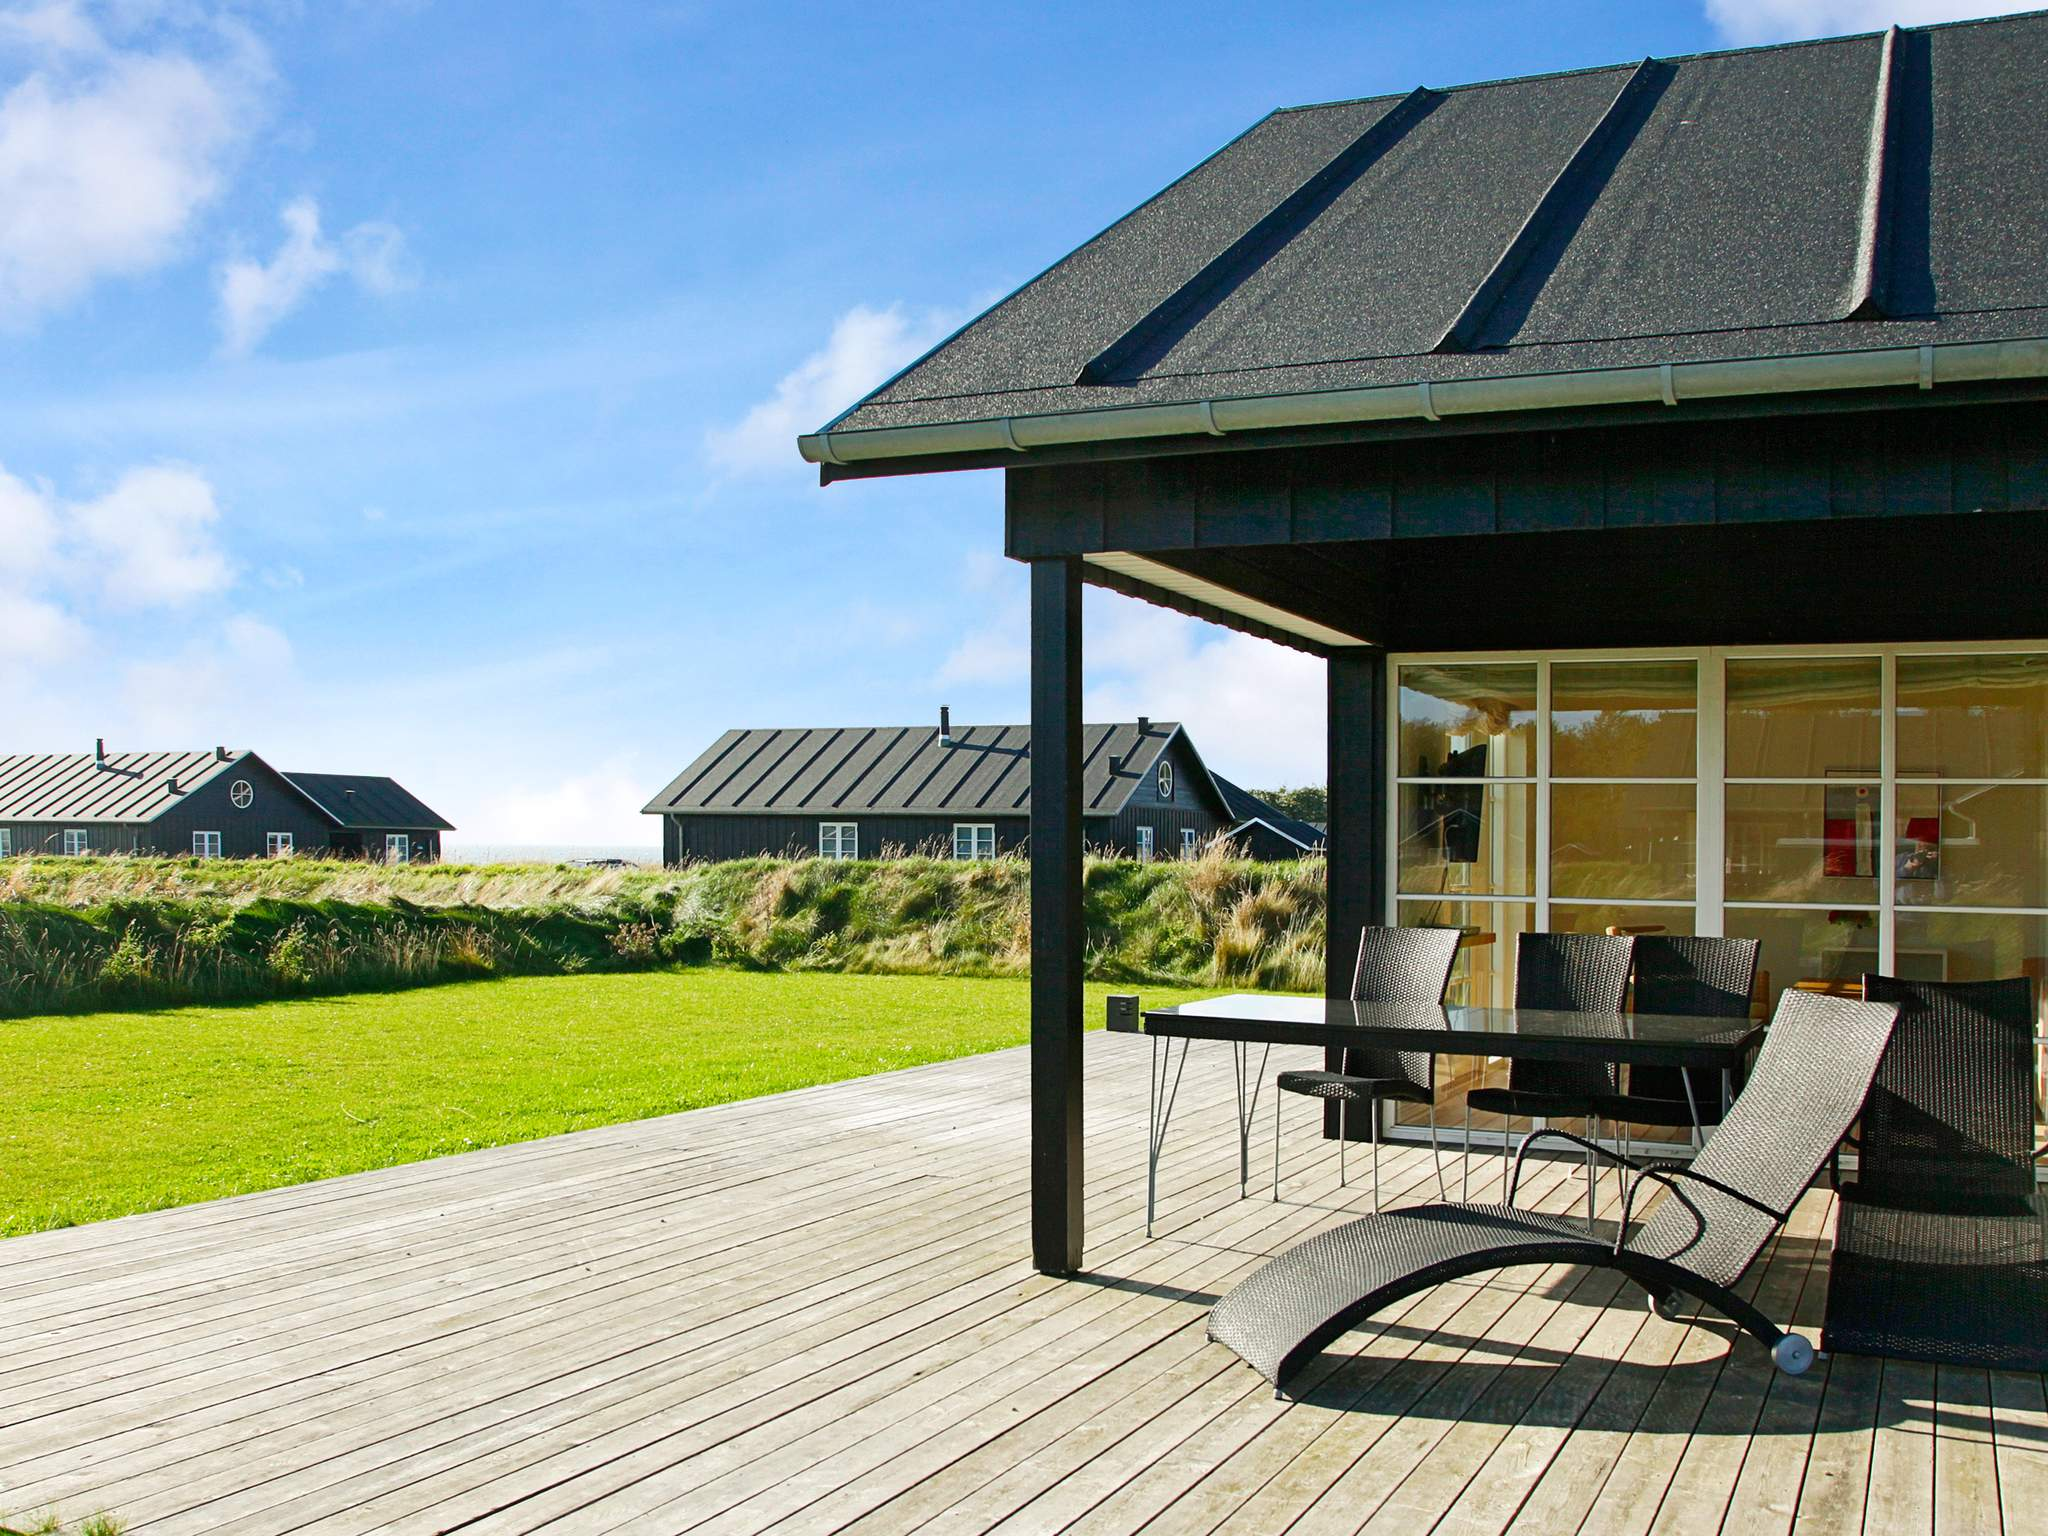 Ferienhaus Nysted (222098), Nysted, , Lolland, Dänemark, Bild 9